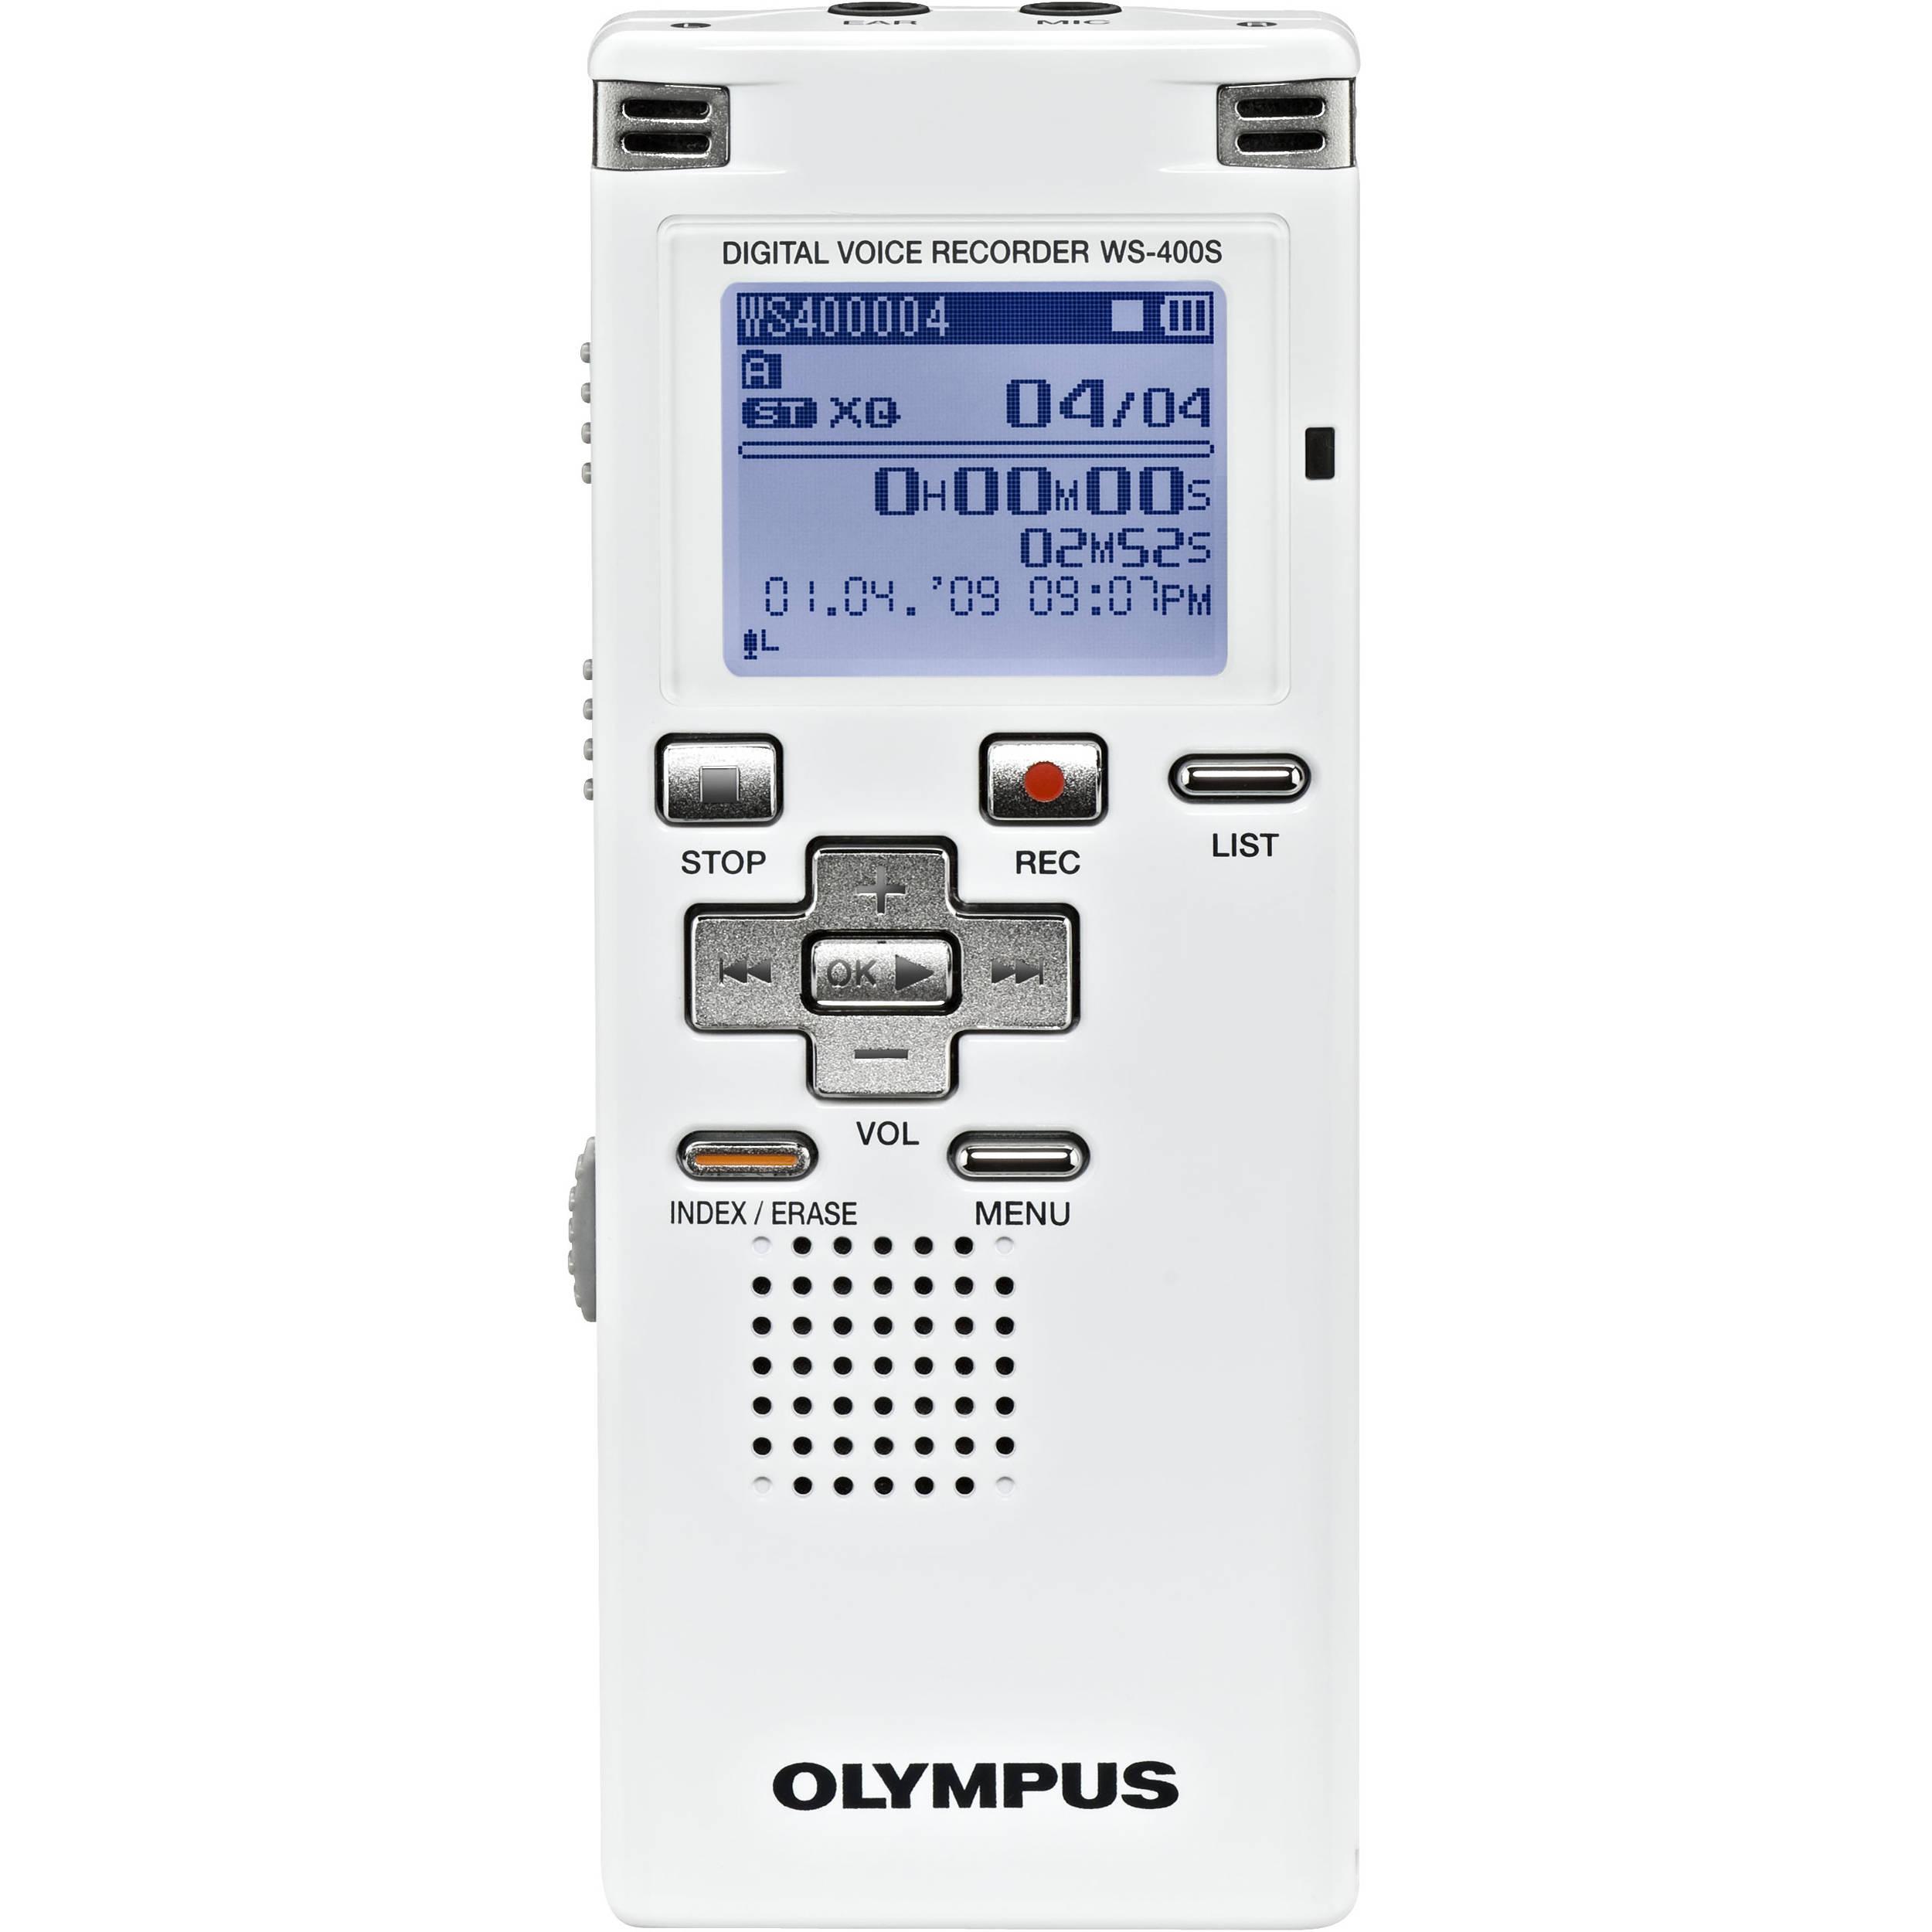 olympus ws 400s digtial voice recorder 142035 b h photo video rh bhphotovideo com Olympus Voice Recorder eHow Olympus Voice Recorder eHow